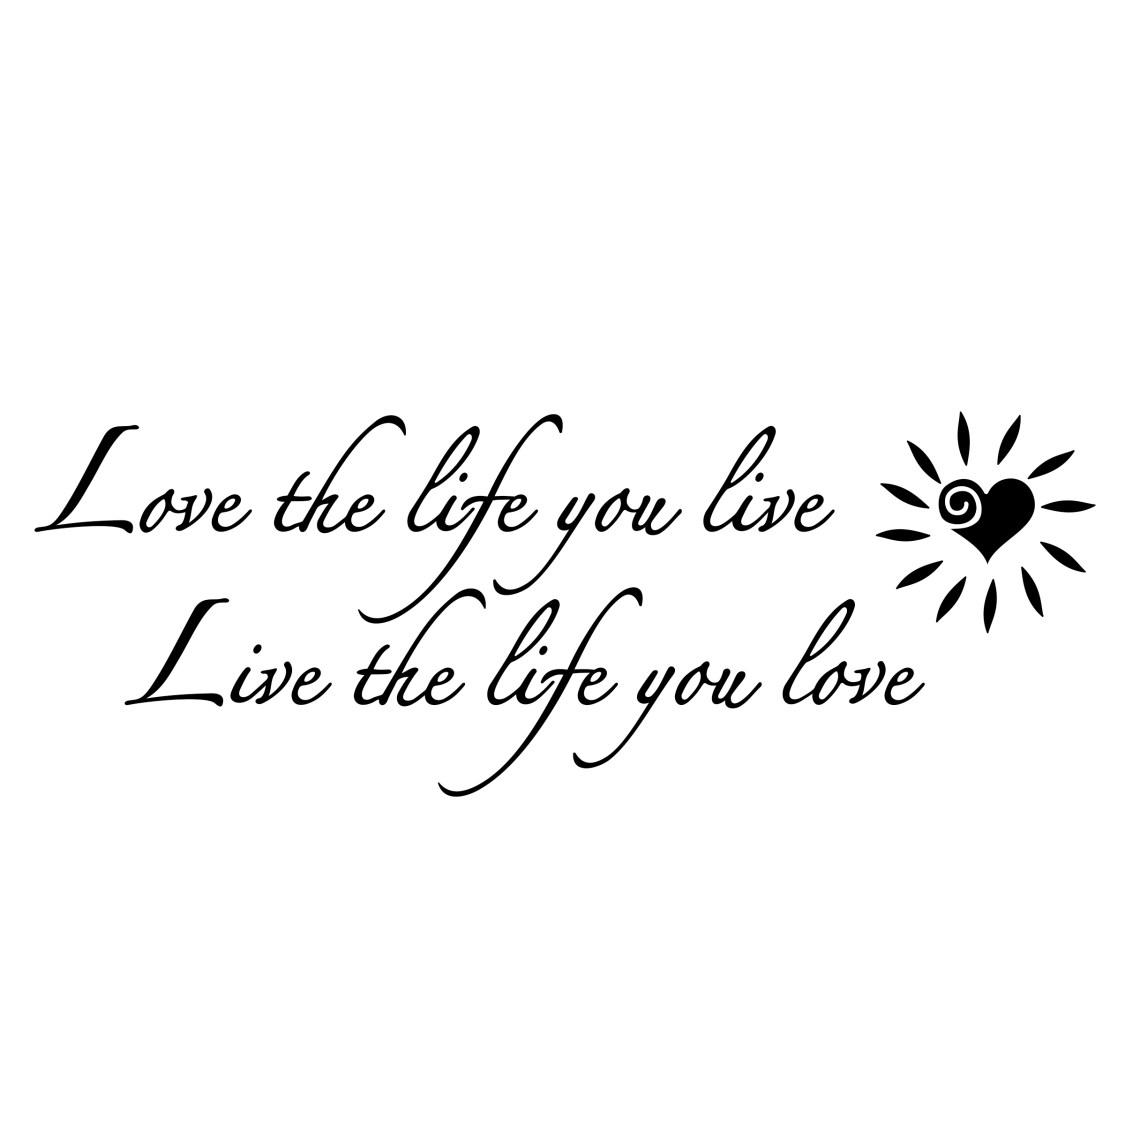 Download Love the life you live heart Design SVG DXF | vectordesign